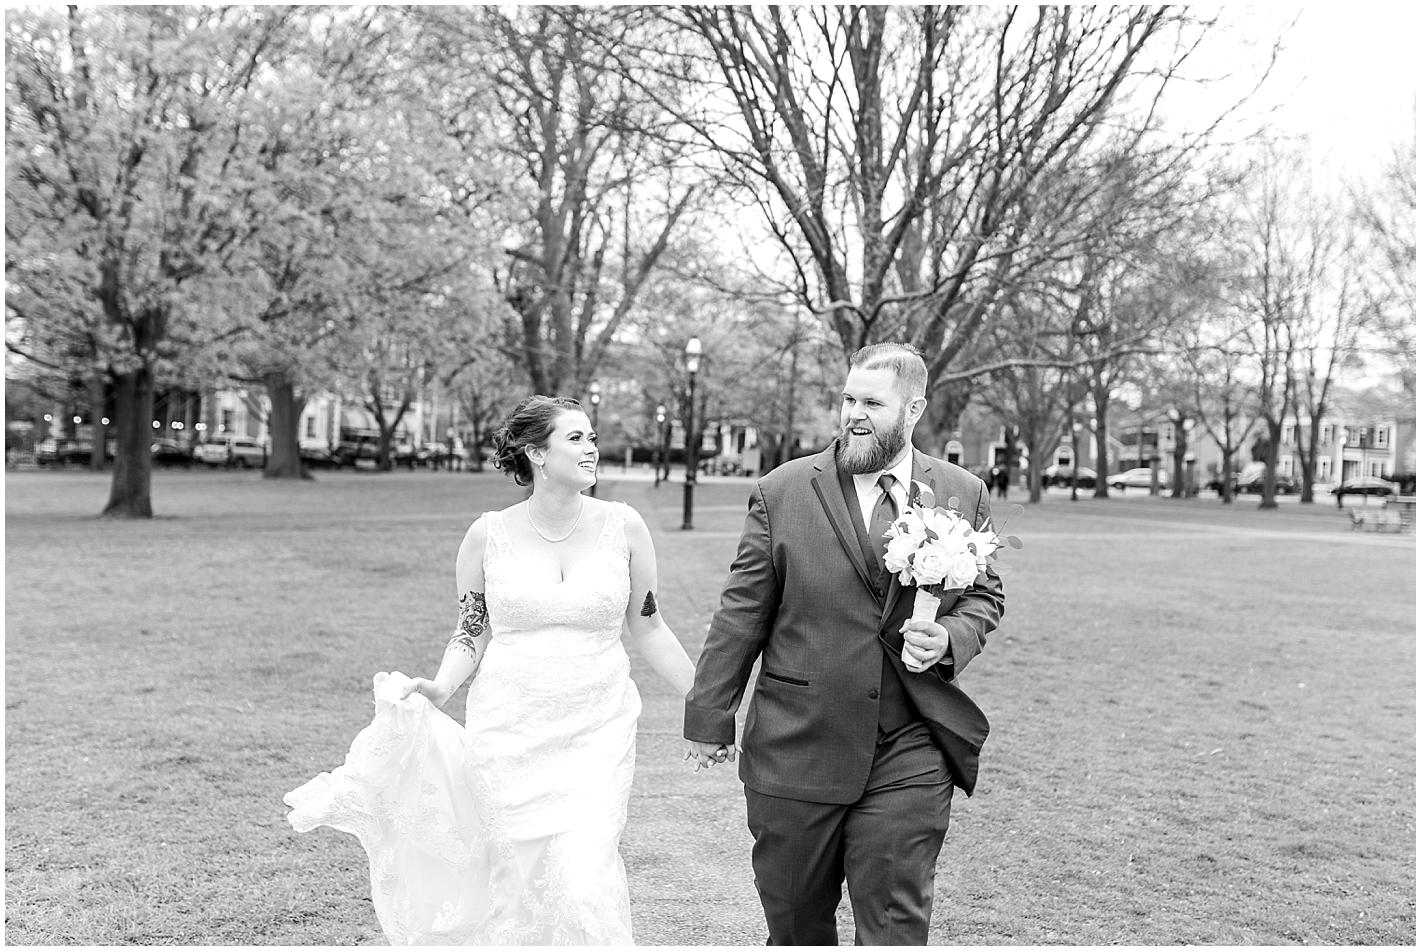 Outdoor Park Wedding Photos By Alyssa Parker Photography